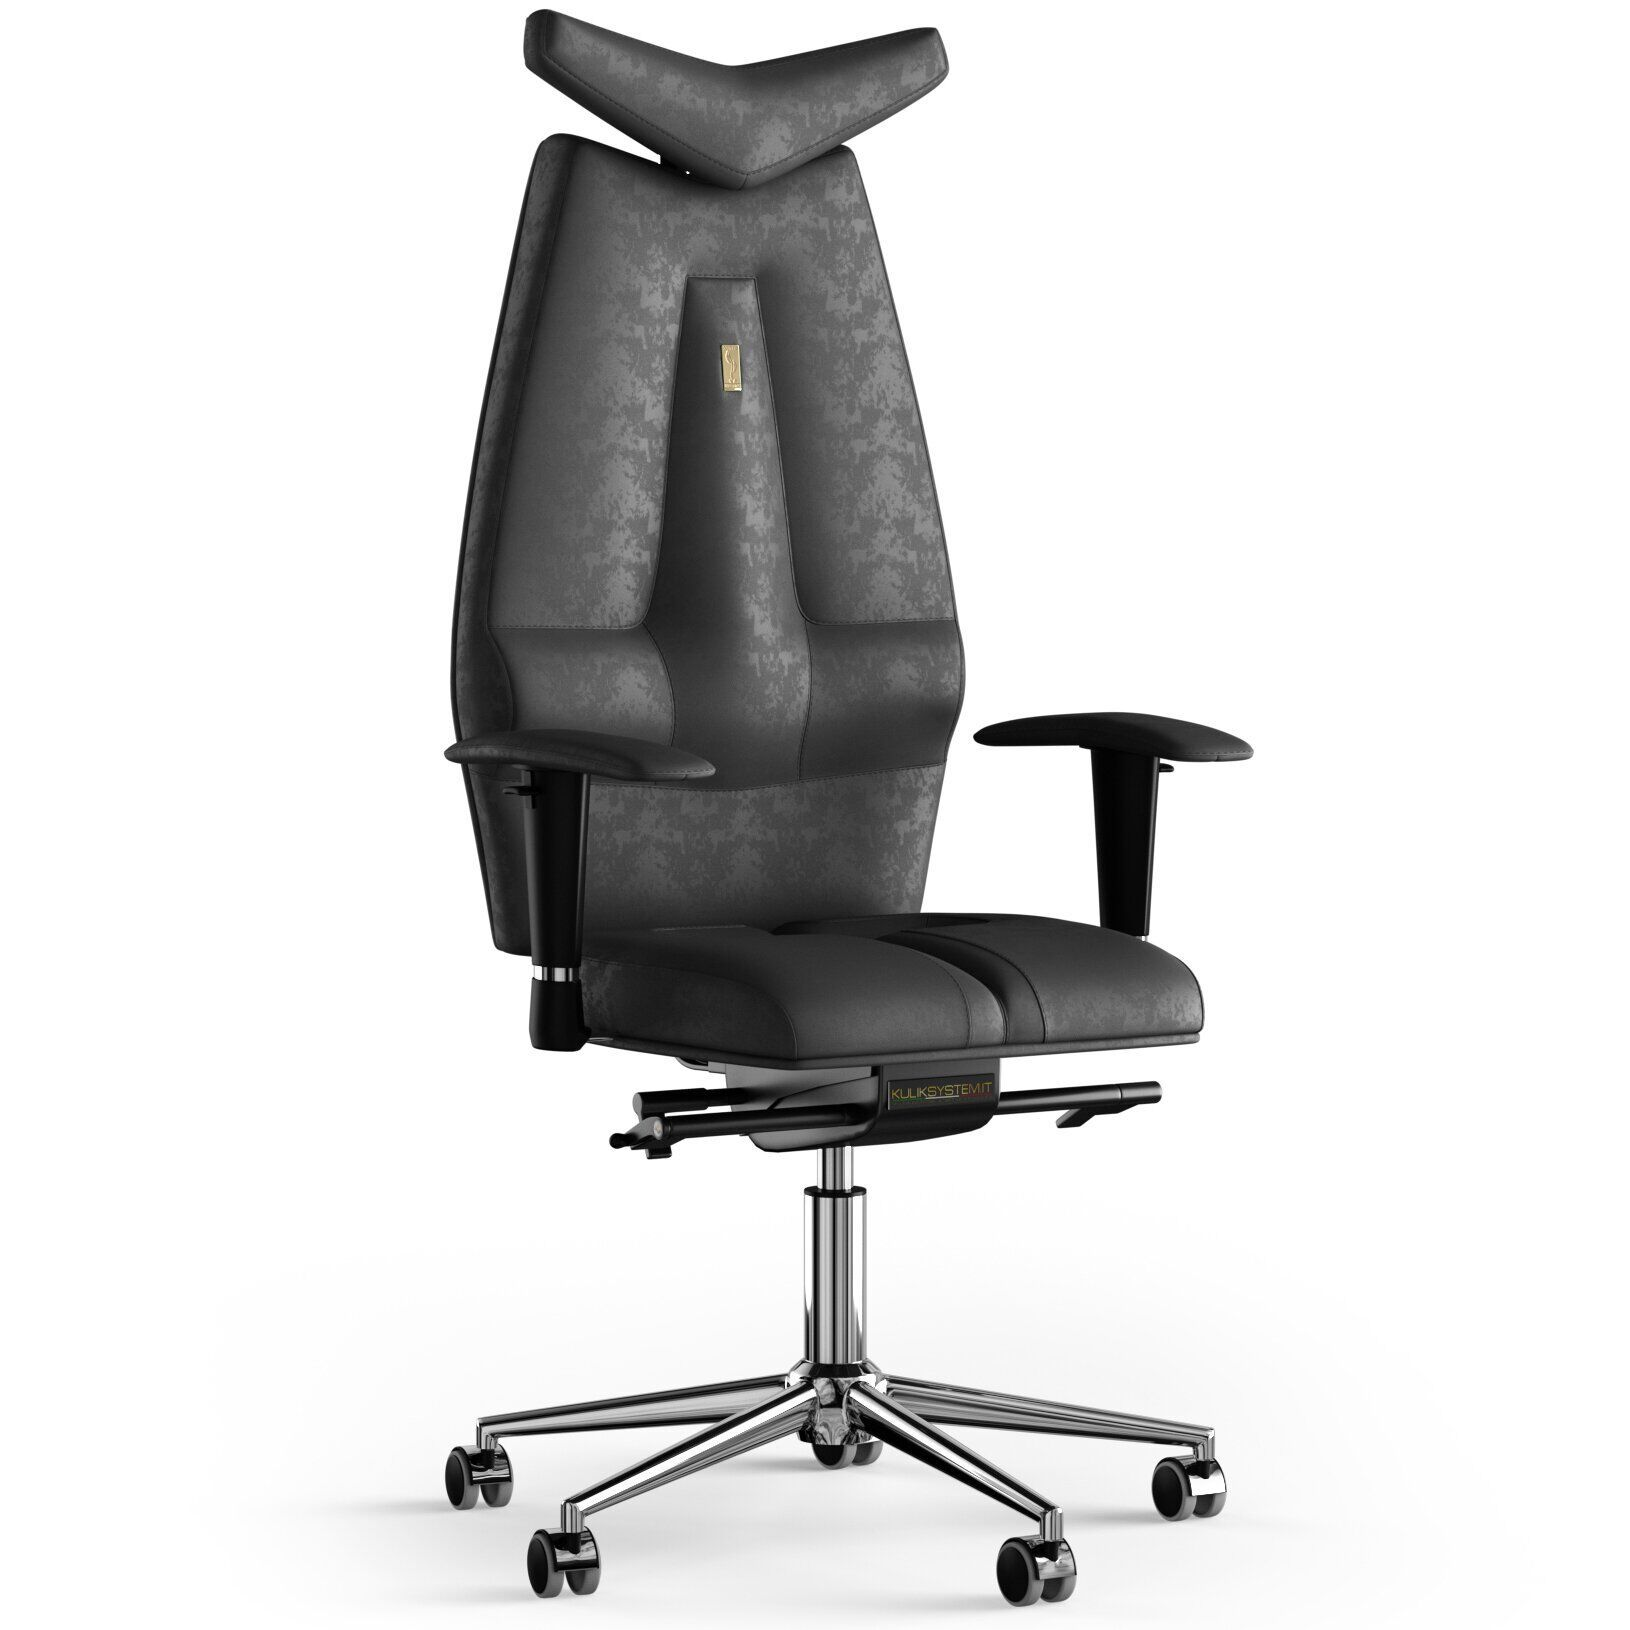 Кресло KULIK SYSTEM JET Антара с подголовником без строчки